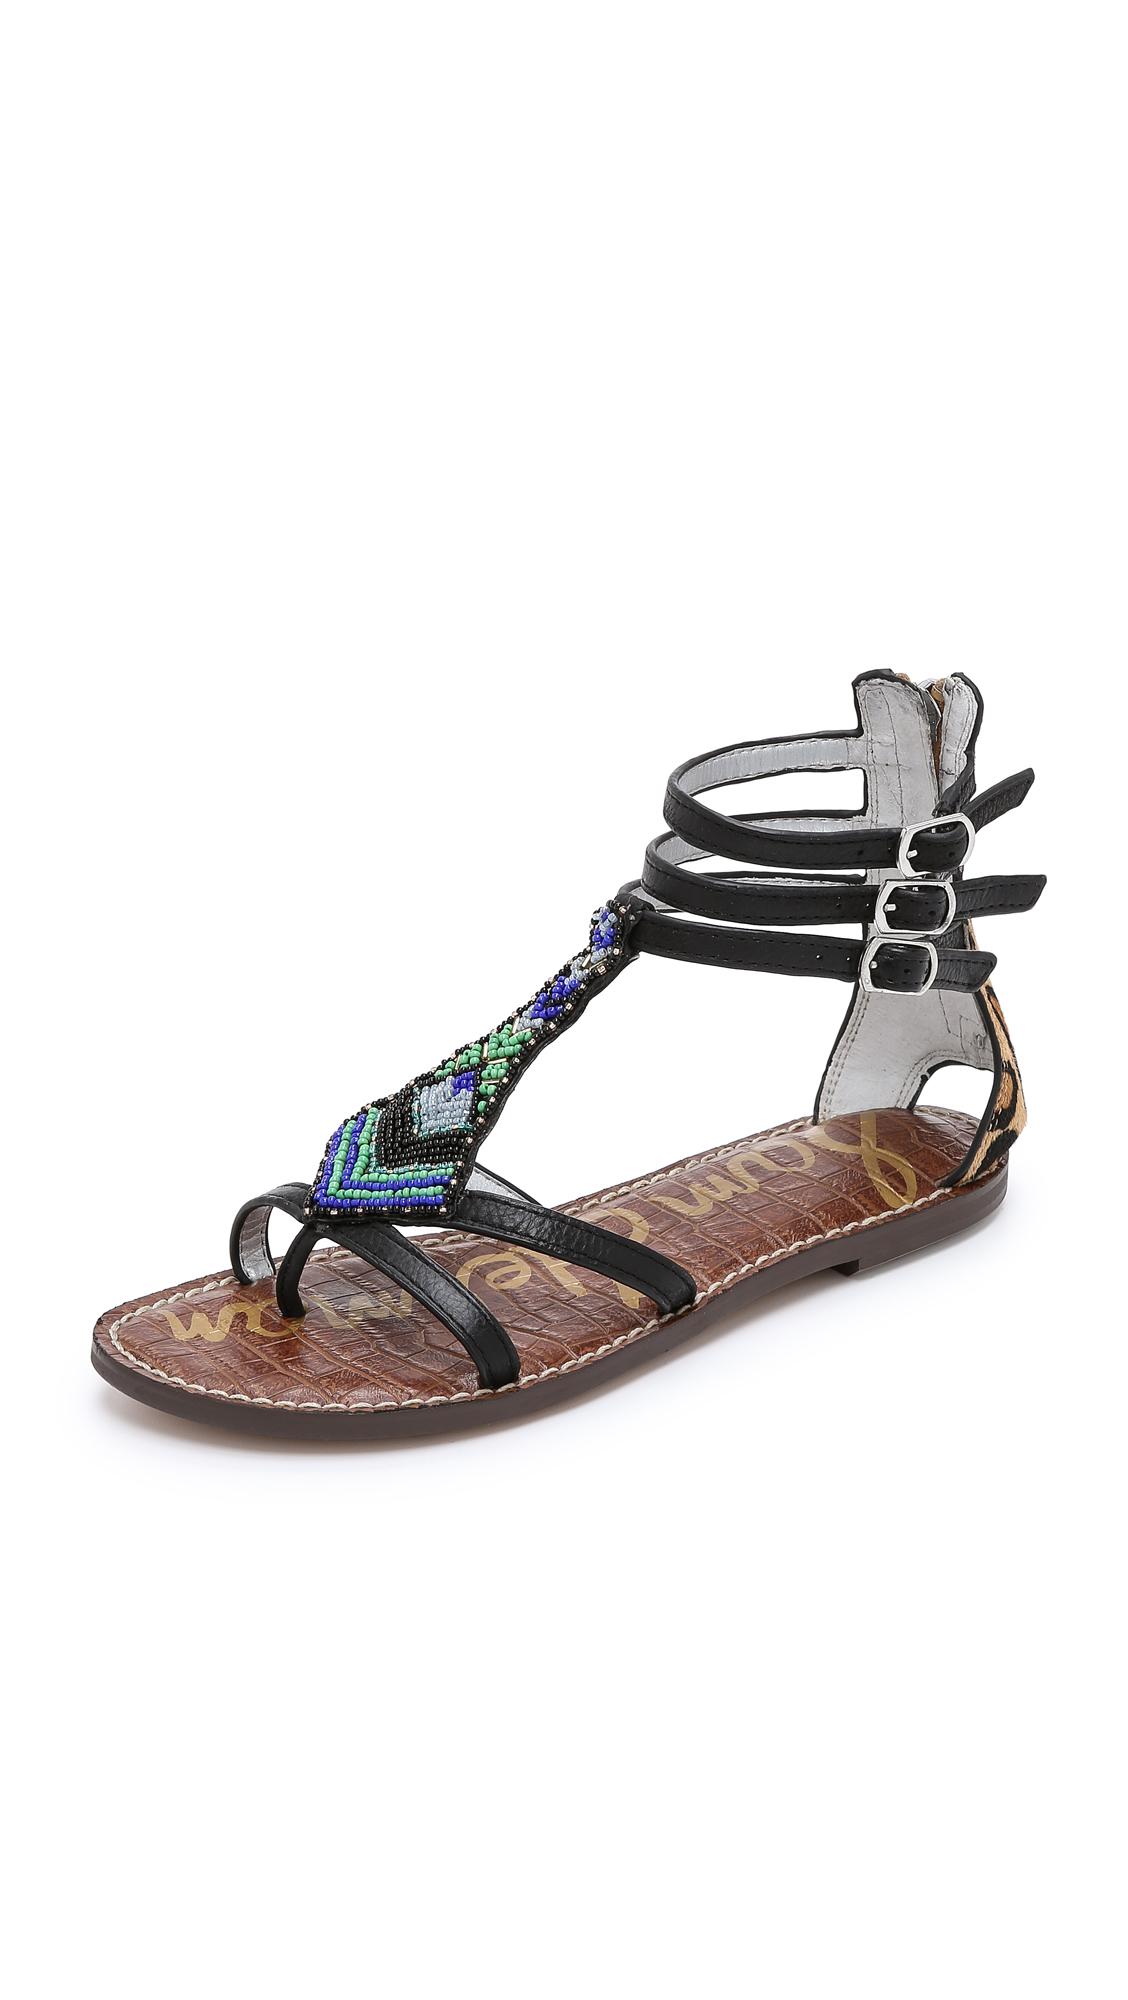 43f7d655b8ff Lyst - Sam Edelman Giselle Beaded Sandals - Black new Nude Leopard